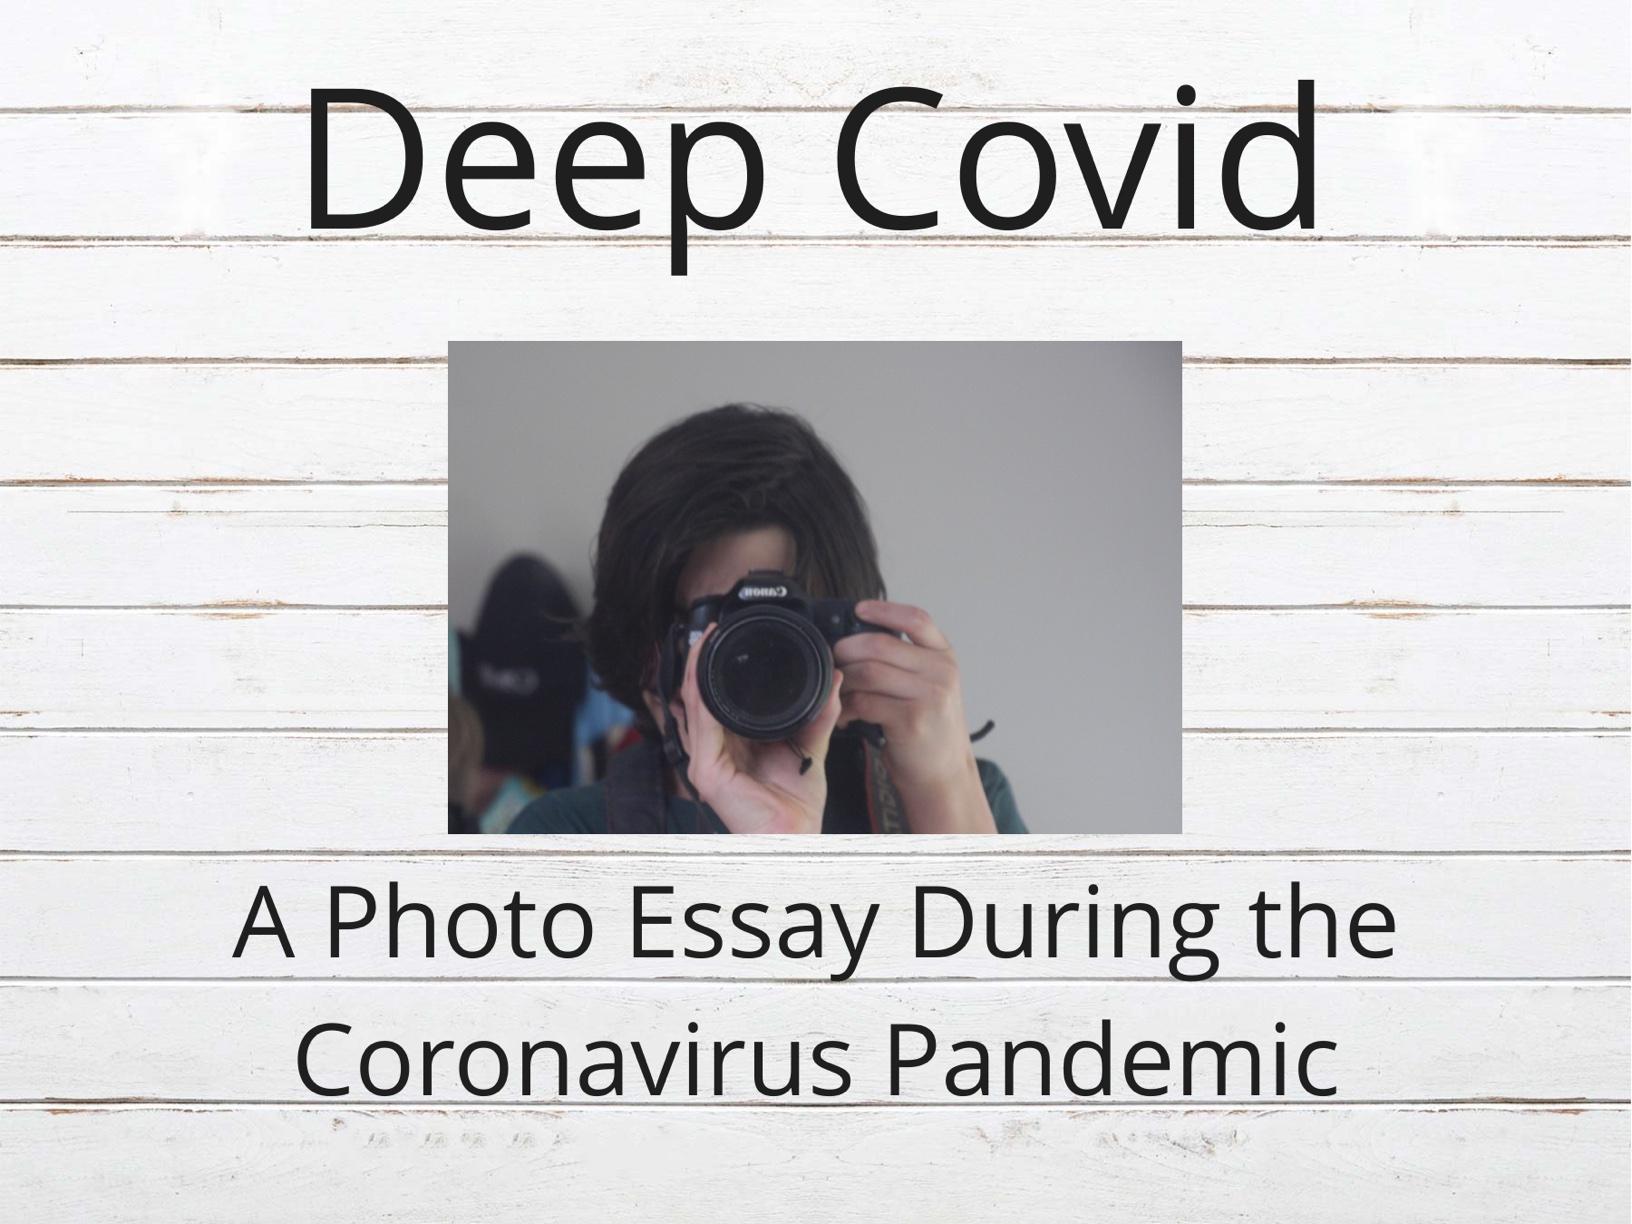 Deep Covid